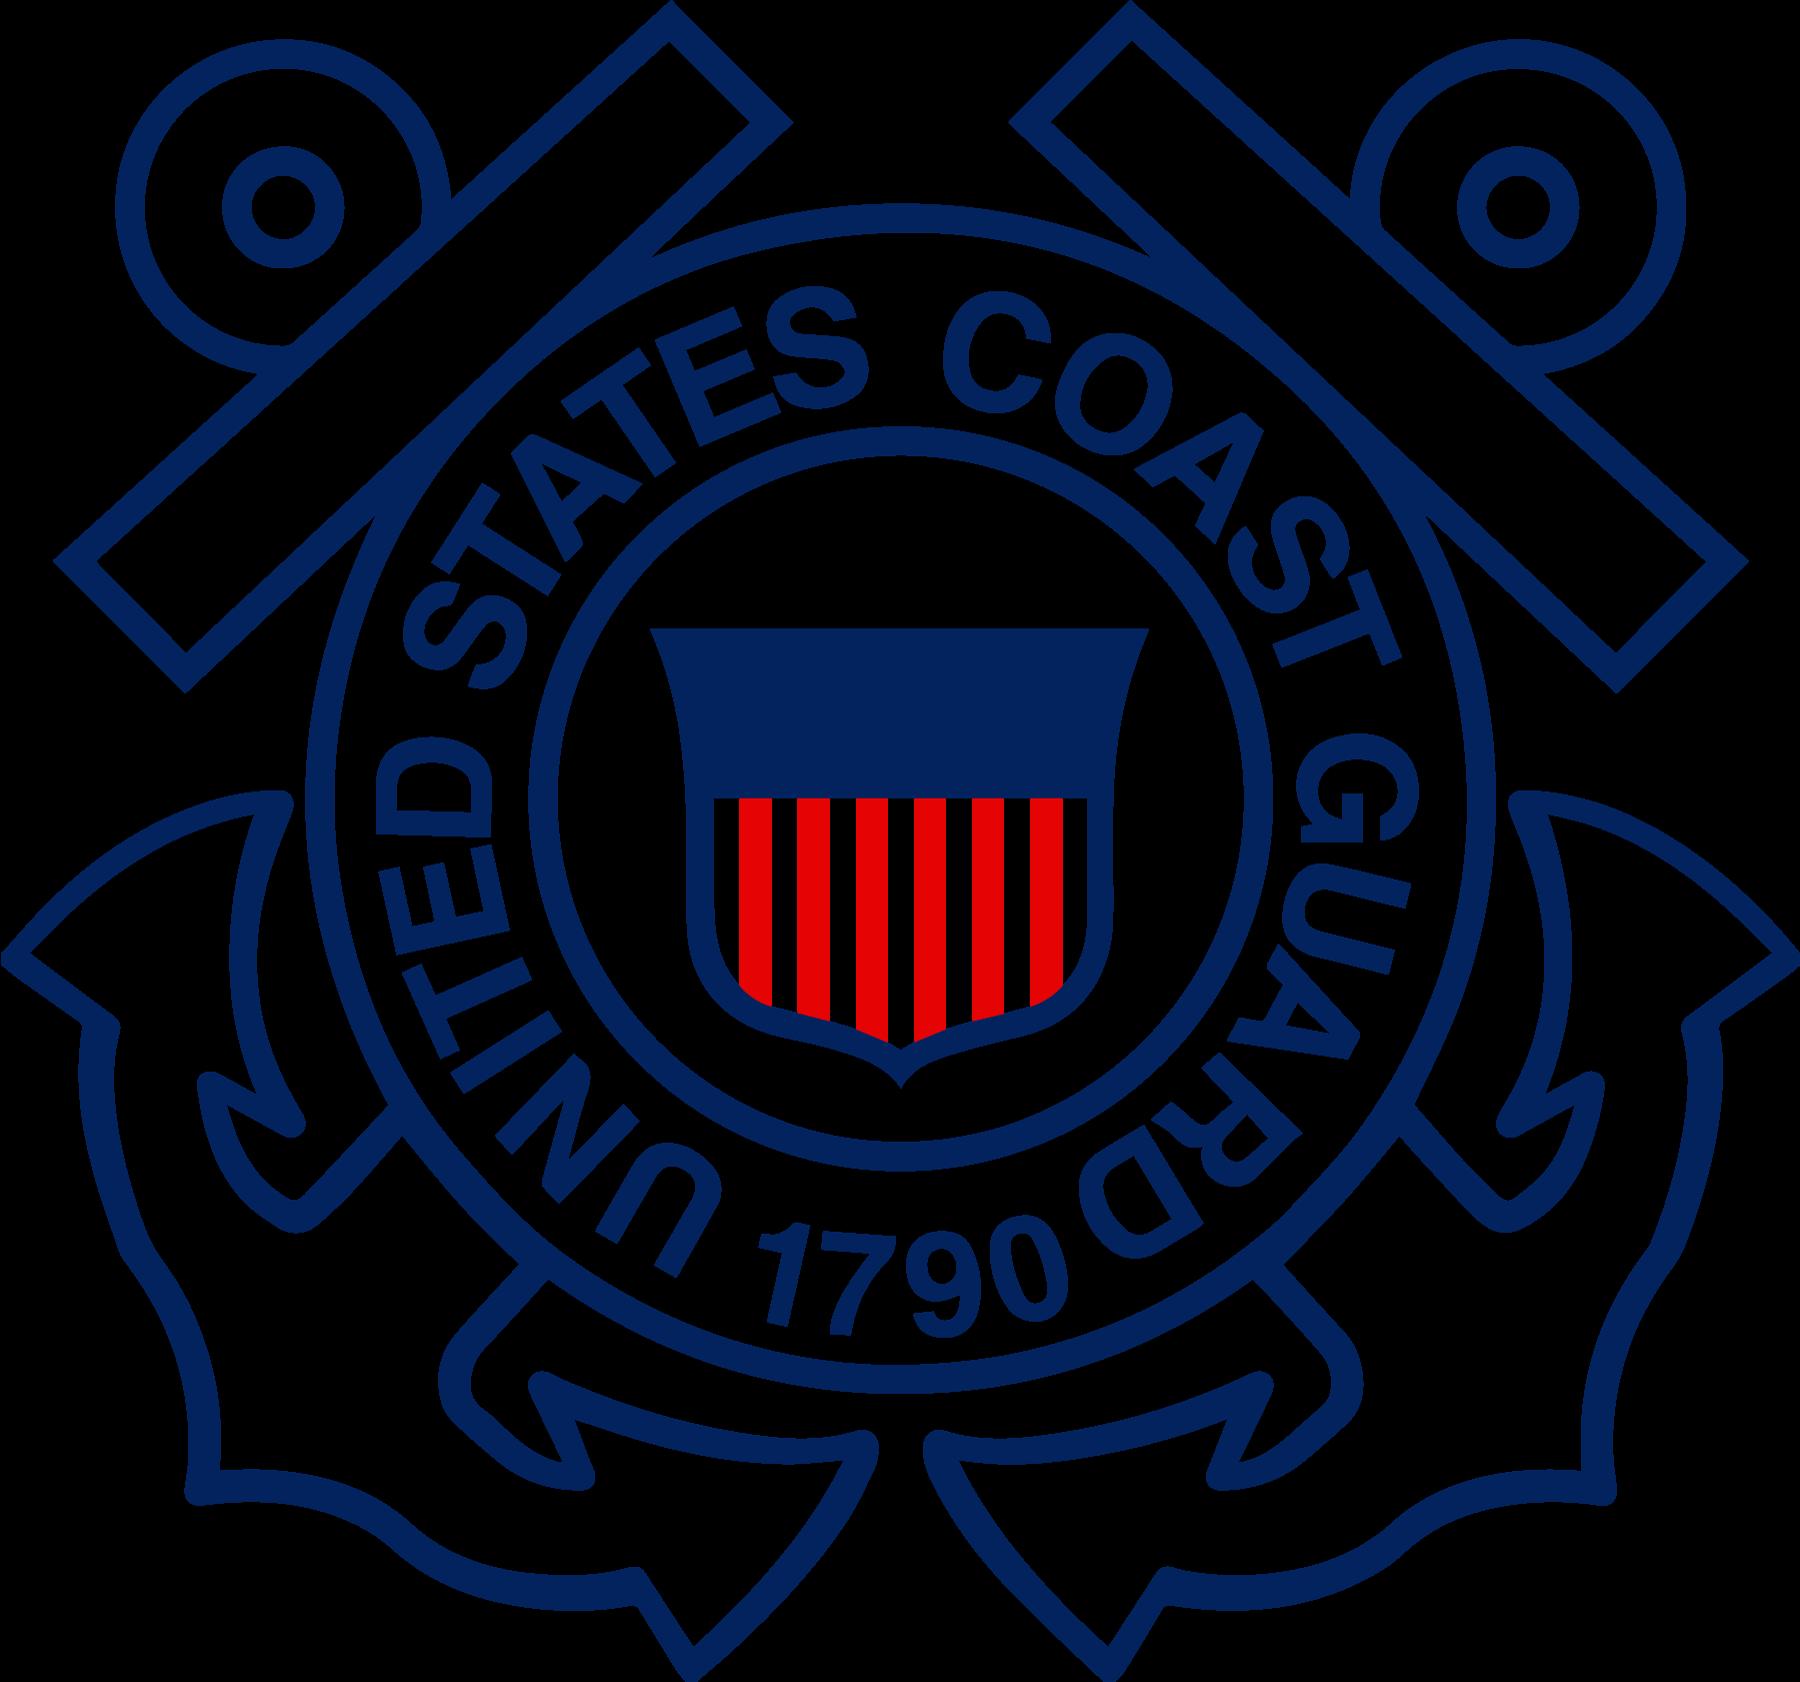 marine corps logo drawing at getdrawings com free for personal use rh getdrawings com logo marine nationale vectoriel marine logo vector file